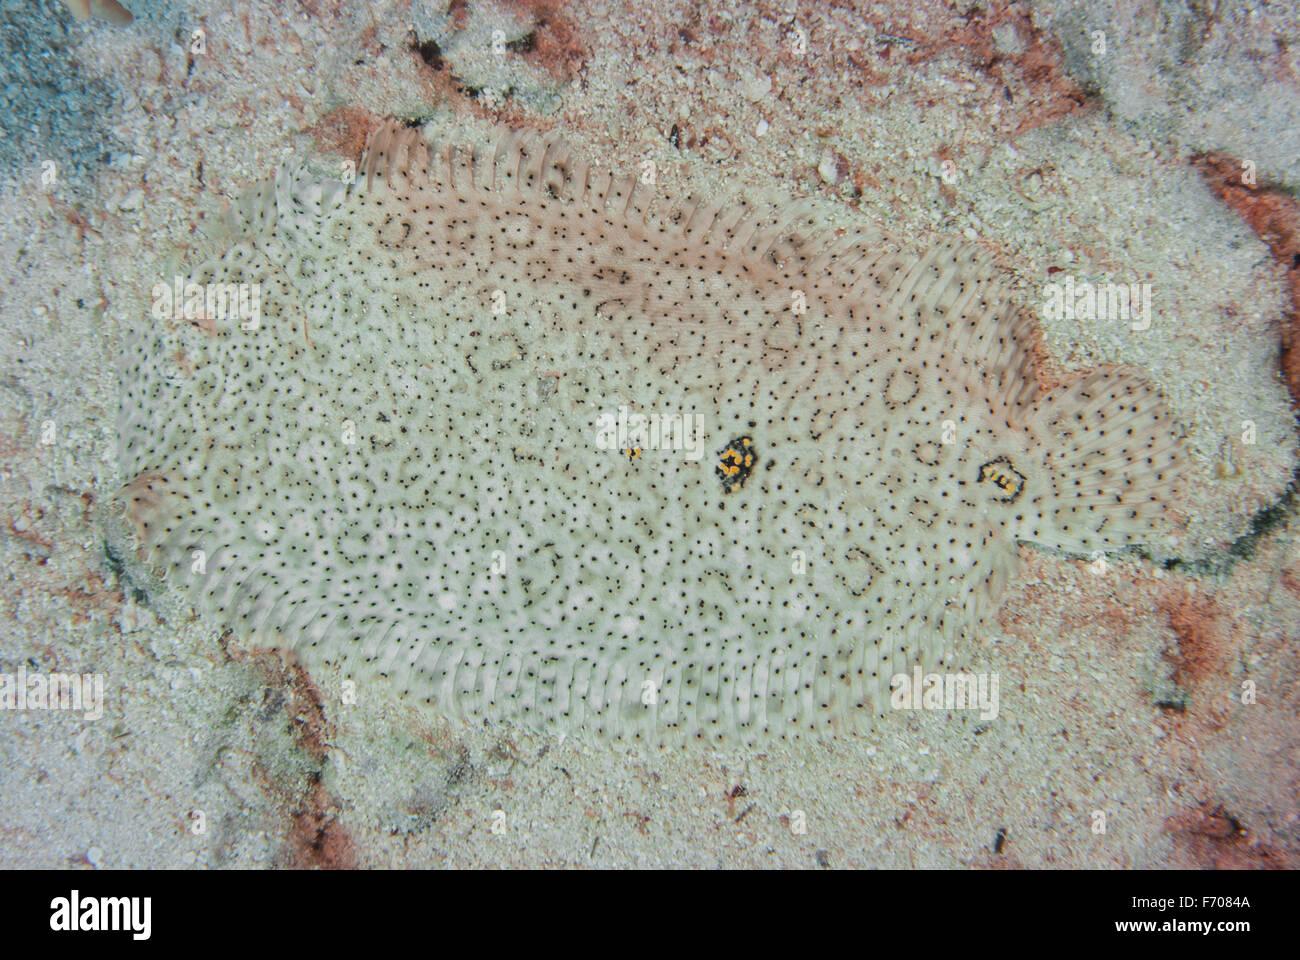 Moses sole, Padachirus marmoratus, Soleidae,  Sharm el Sheikh, Red Sea, Egypt - Stock Image